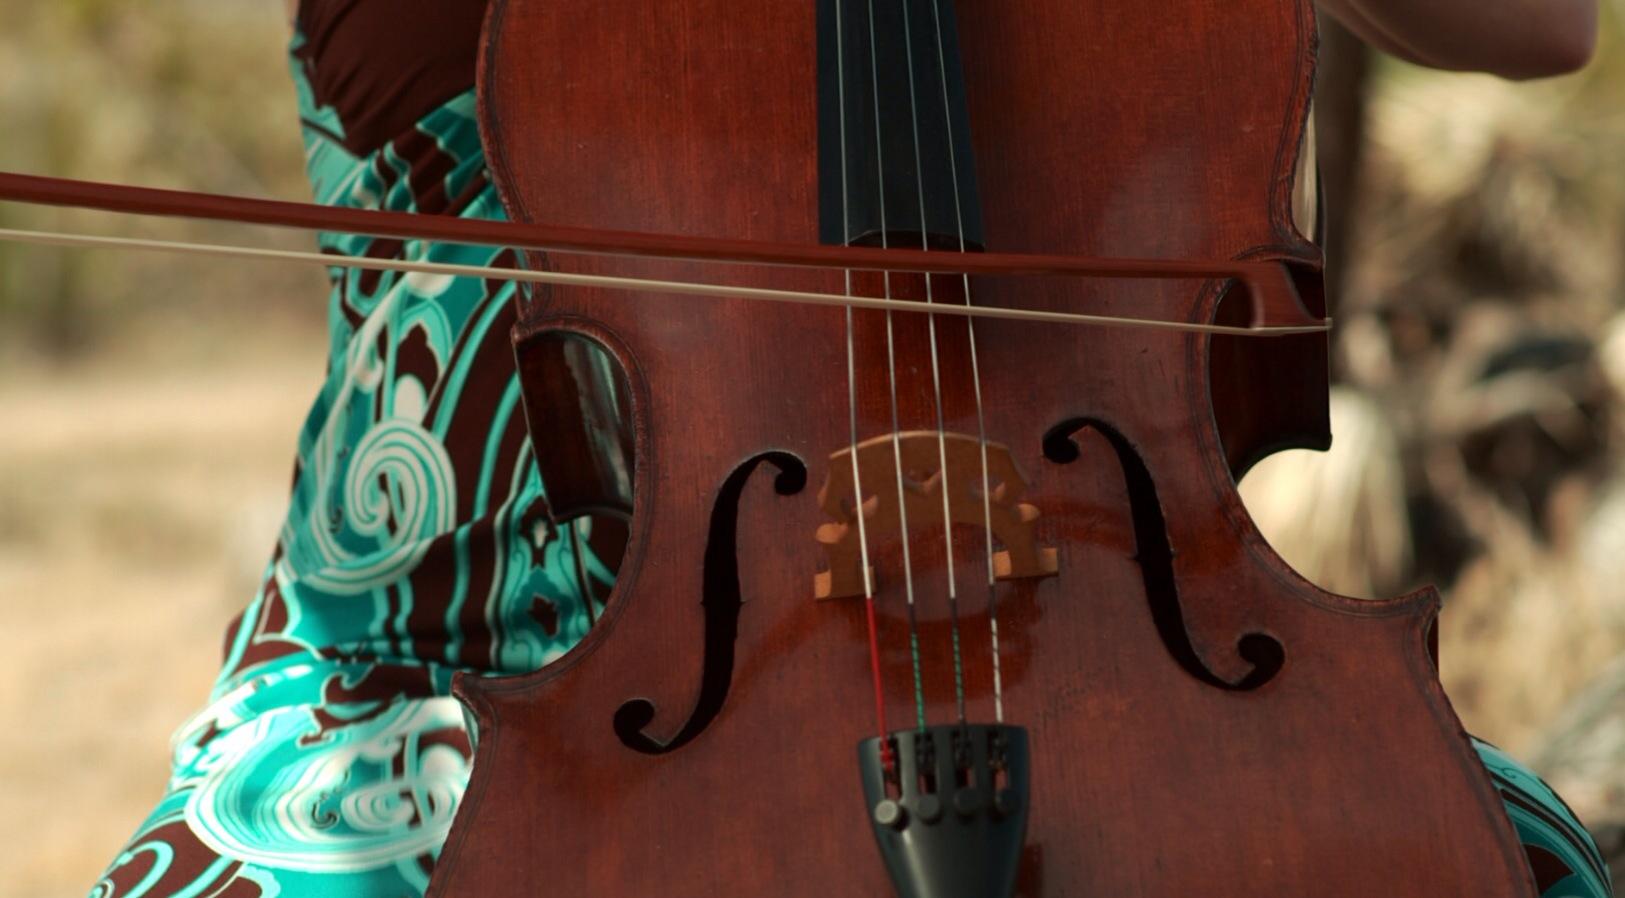 Hi_res_violin.JPG